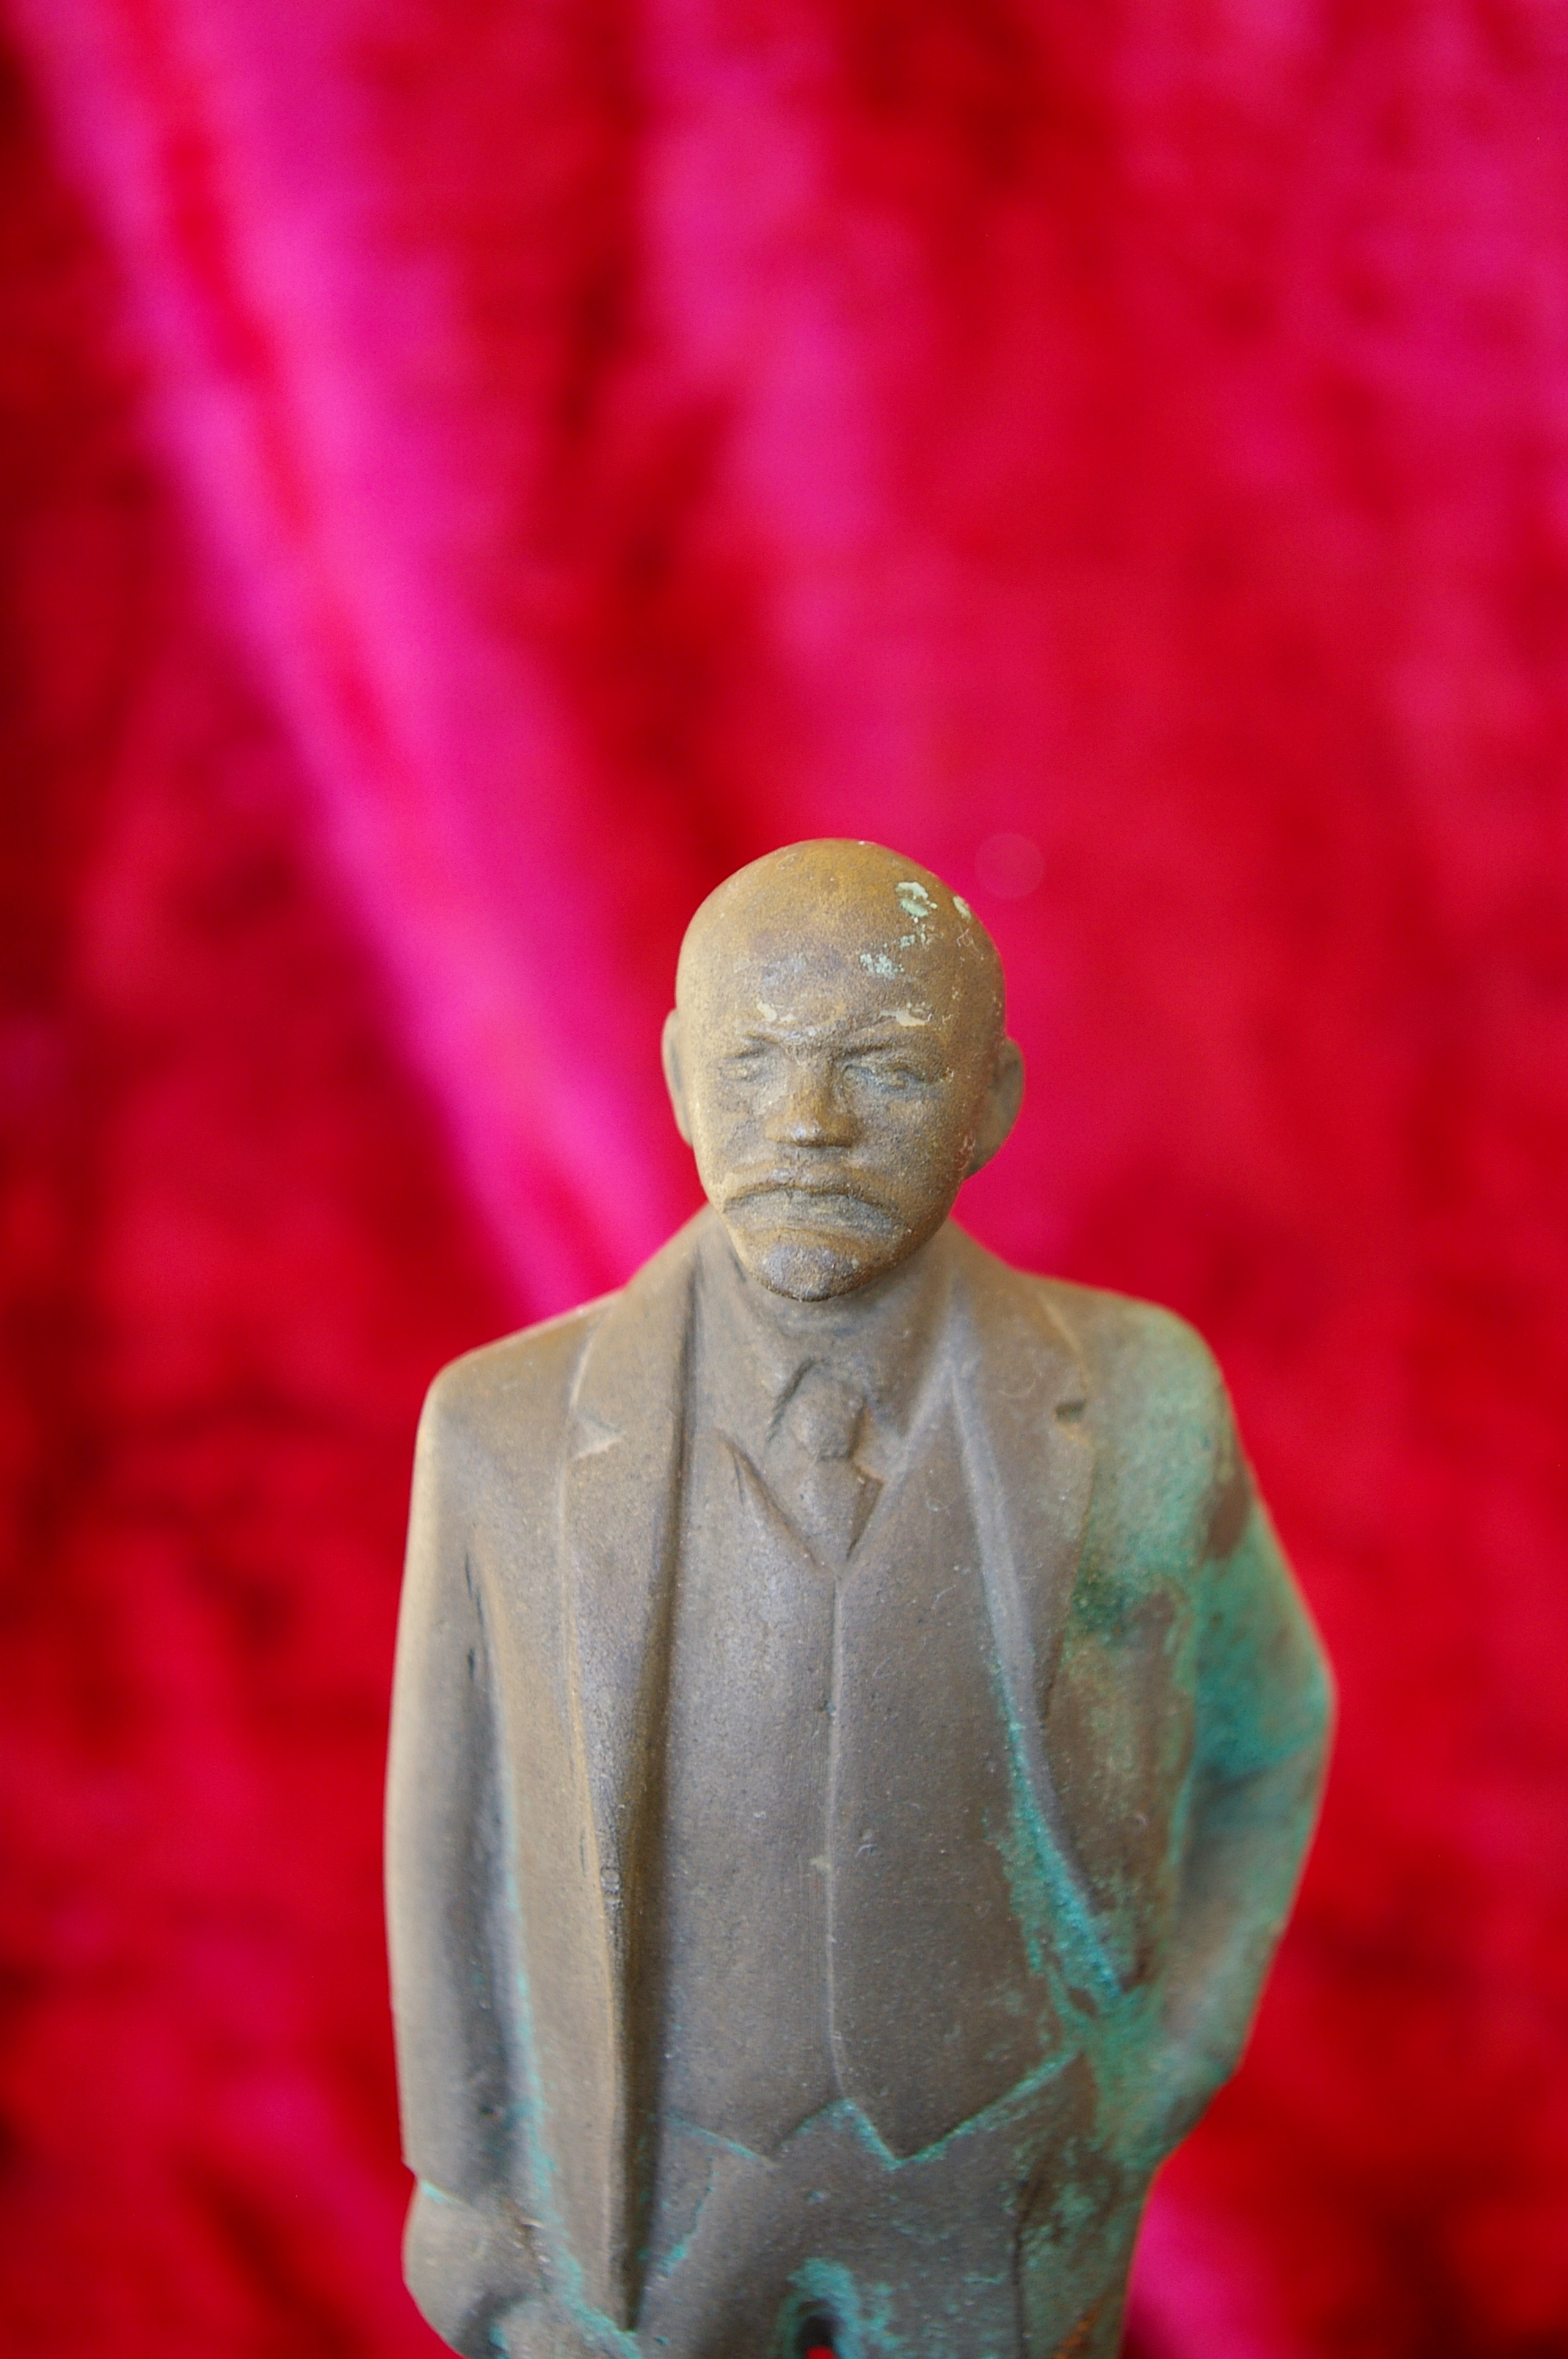 Скульптура Ленин на постаменте, материал бронза, высота 35 см., ширина 20 см., длина 20 см. - 5